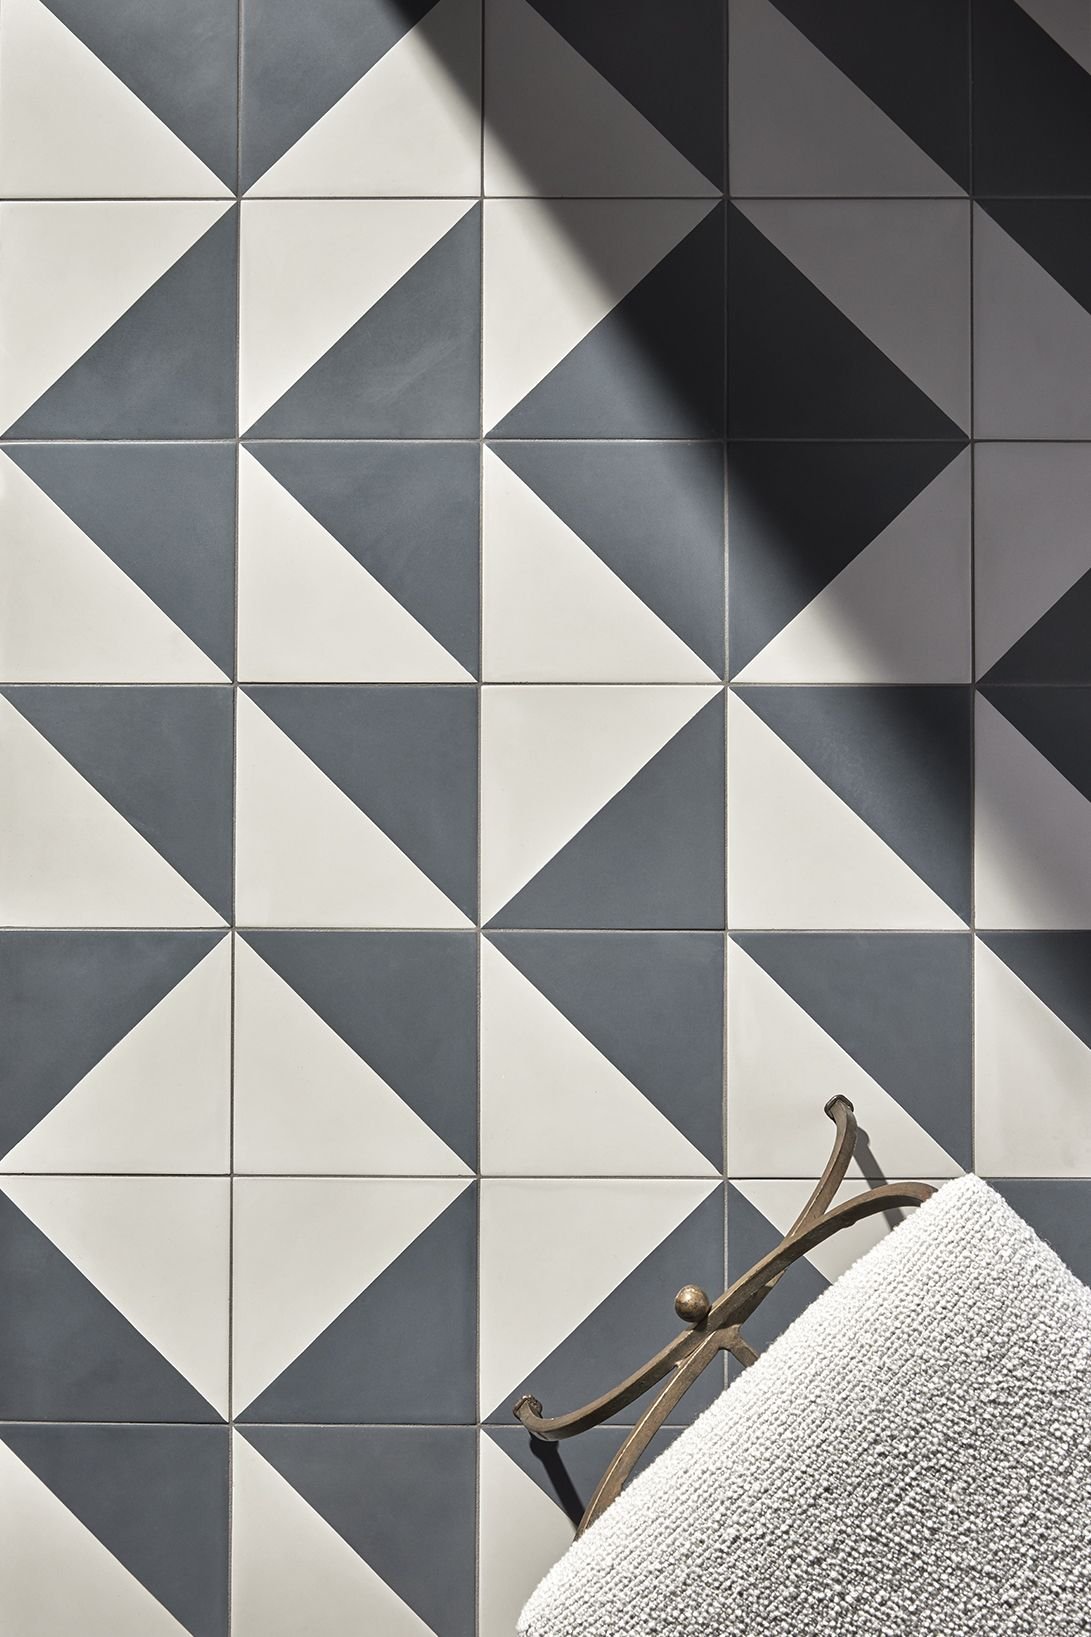 Promenade Decorative Field Tile Dash Geometric Tiles Bathroom Bathroom Decor White Bathroom Designs